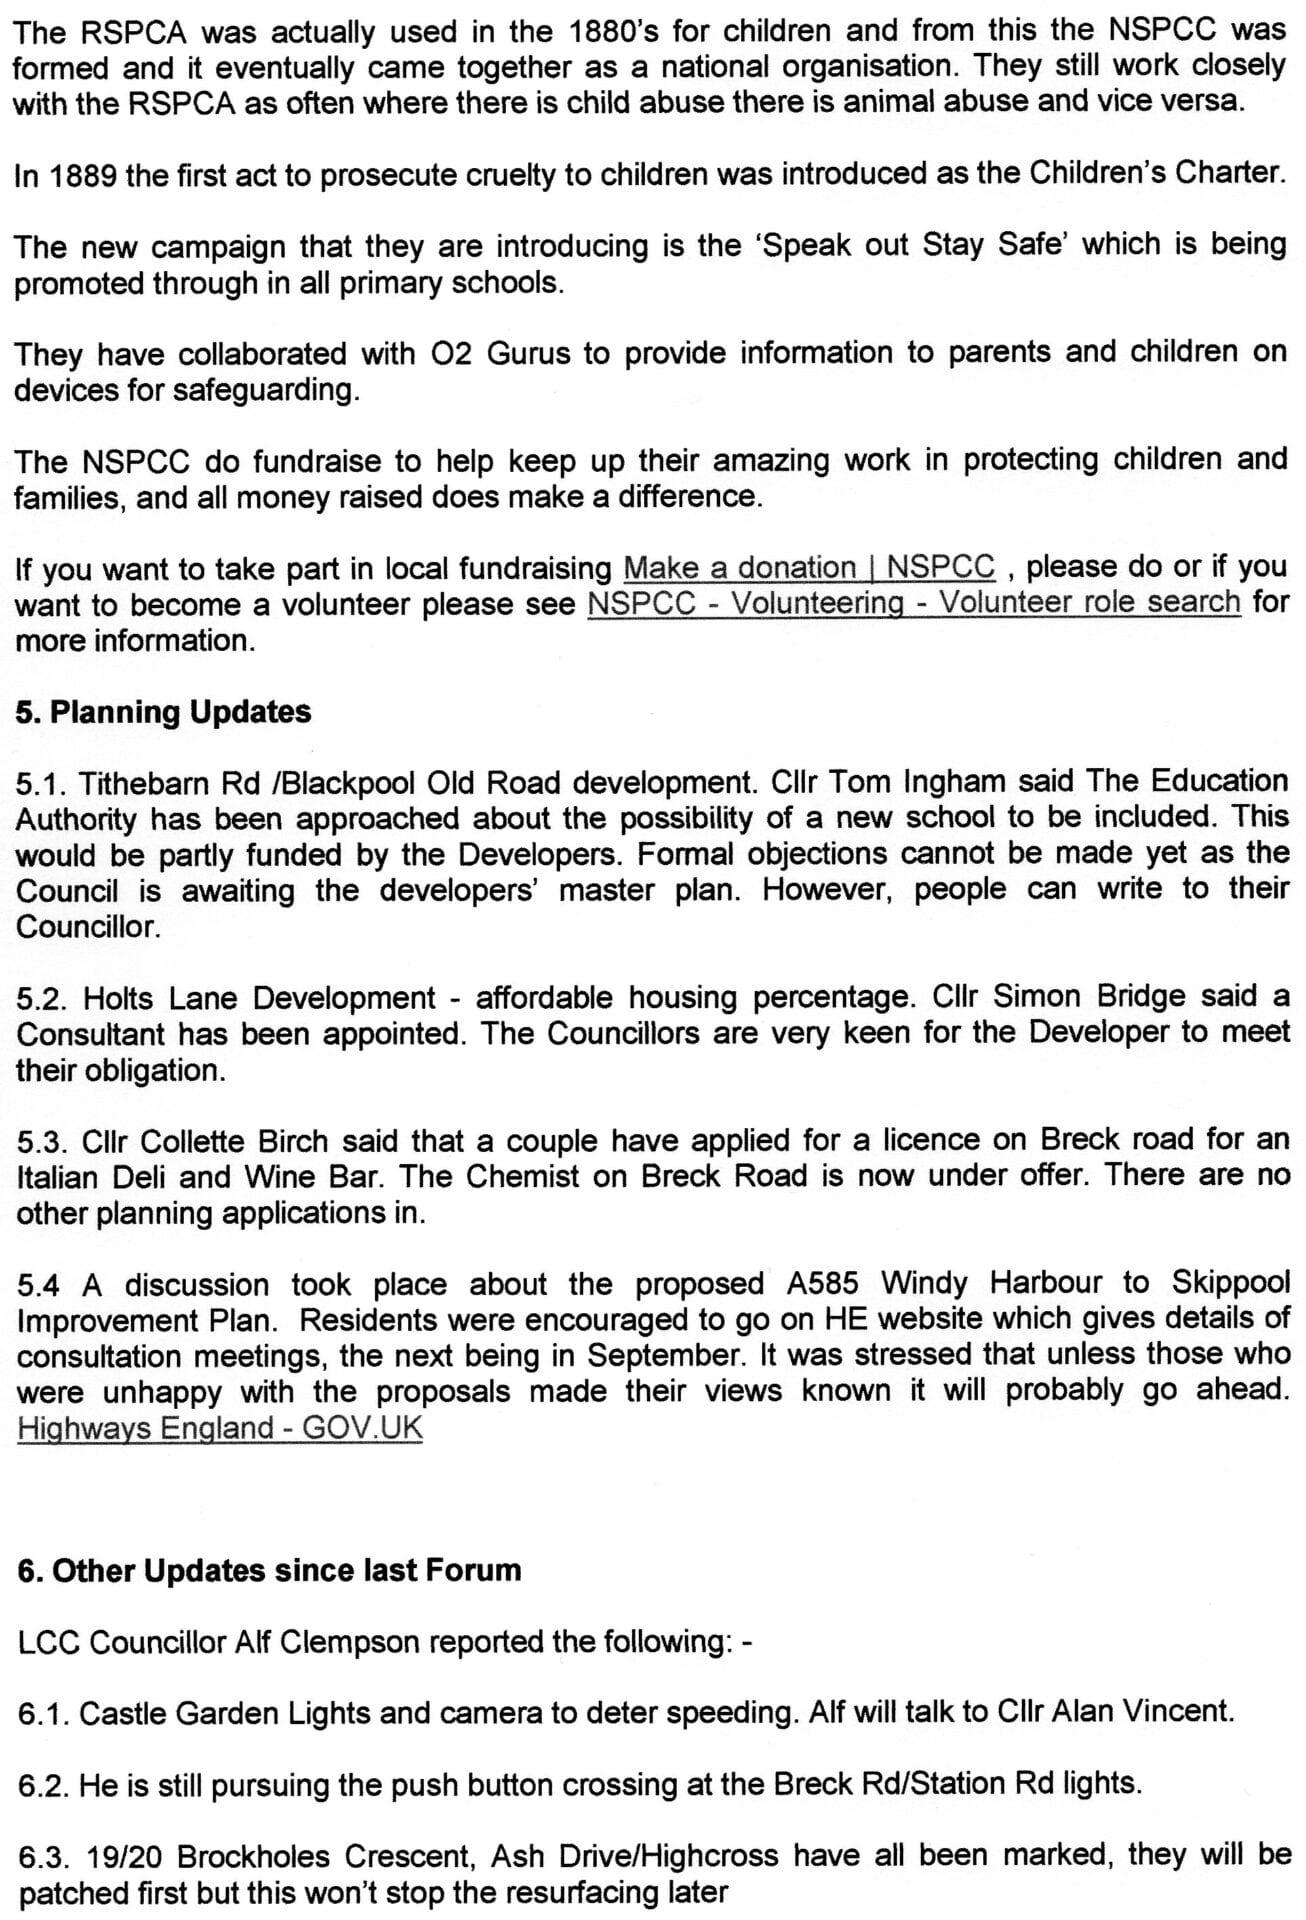 Minutes of Poulton Forum August 2019, page 2